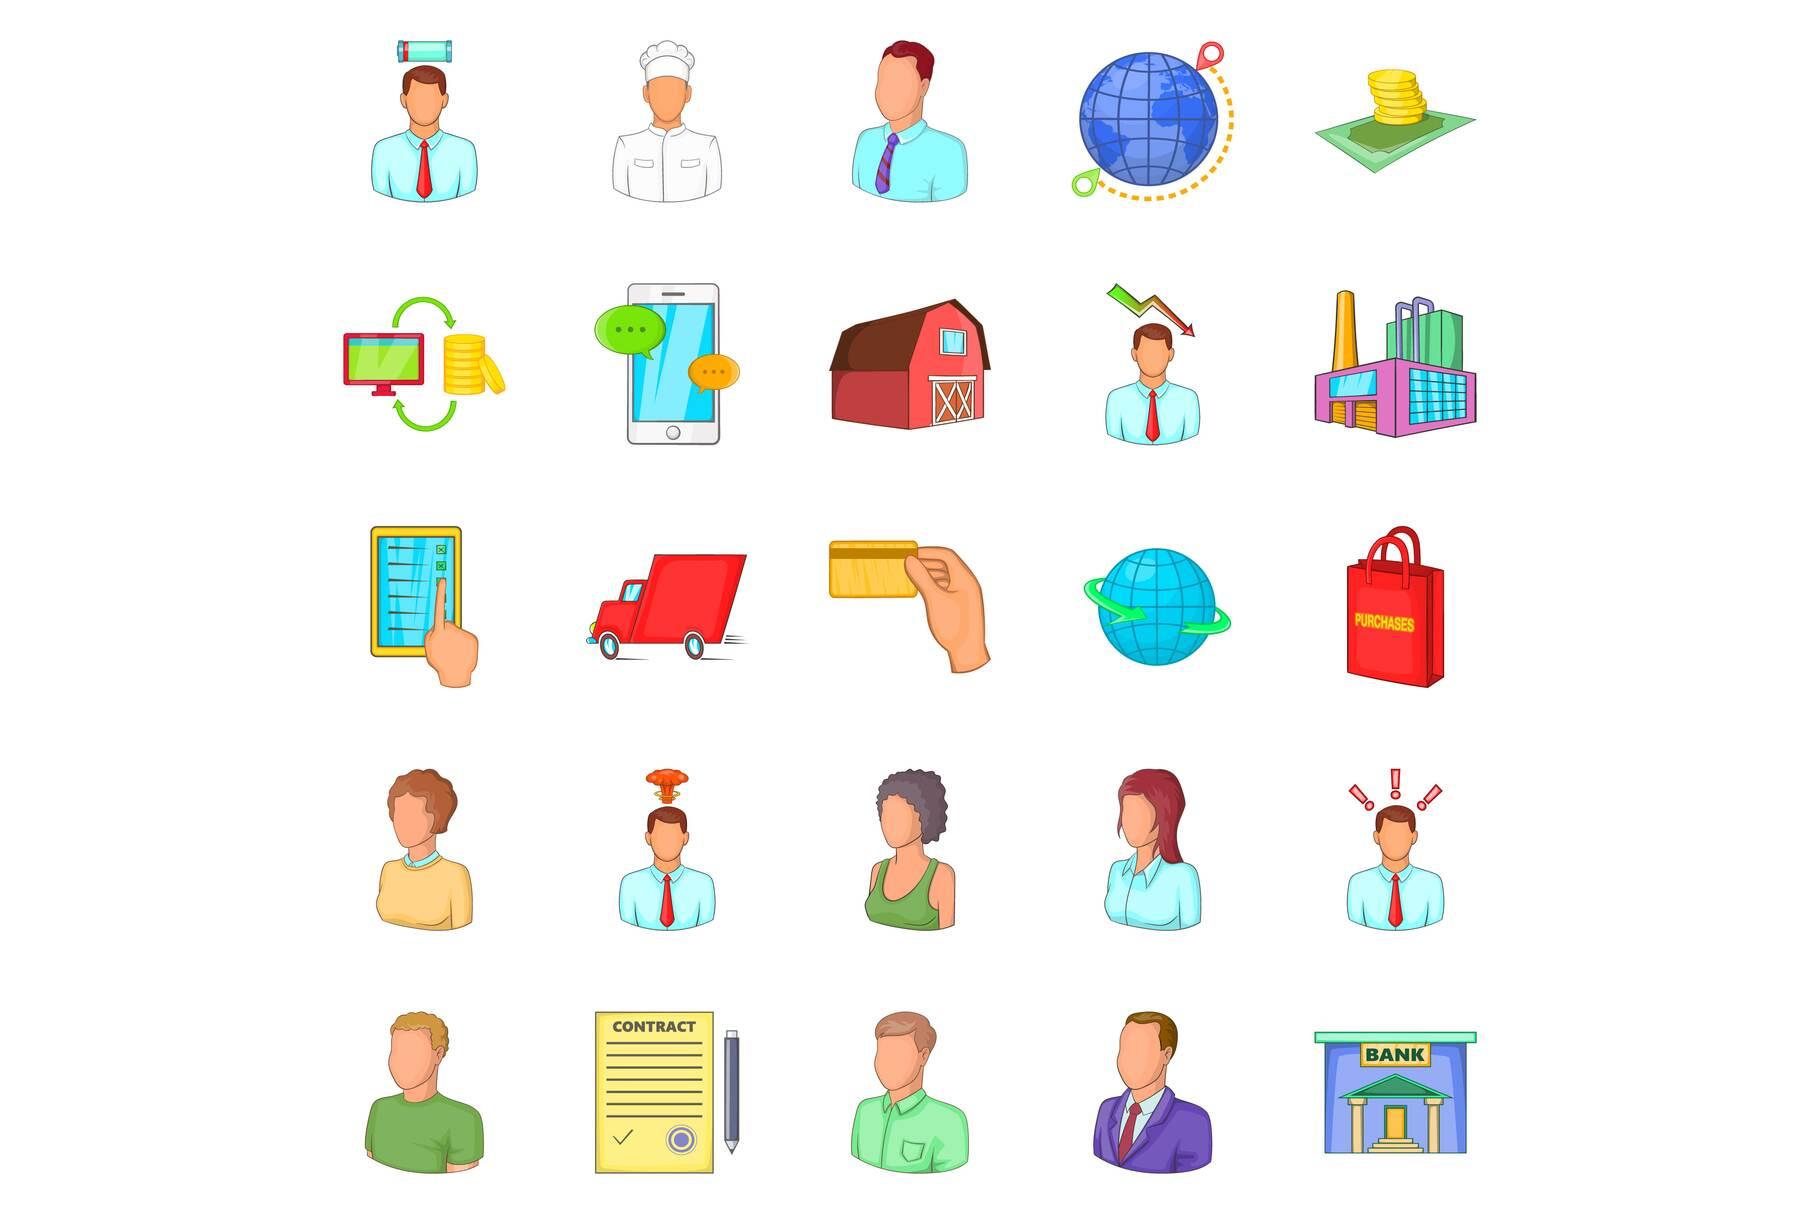 Distributive trades icons set, cartoon style example image 1